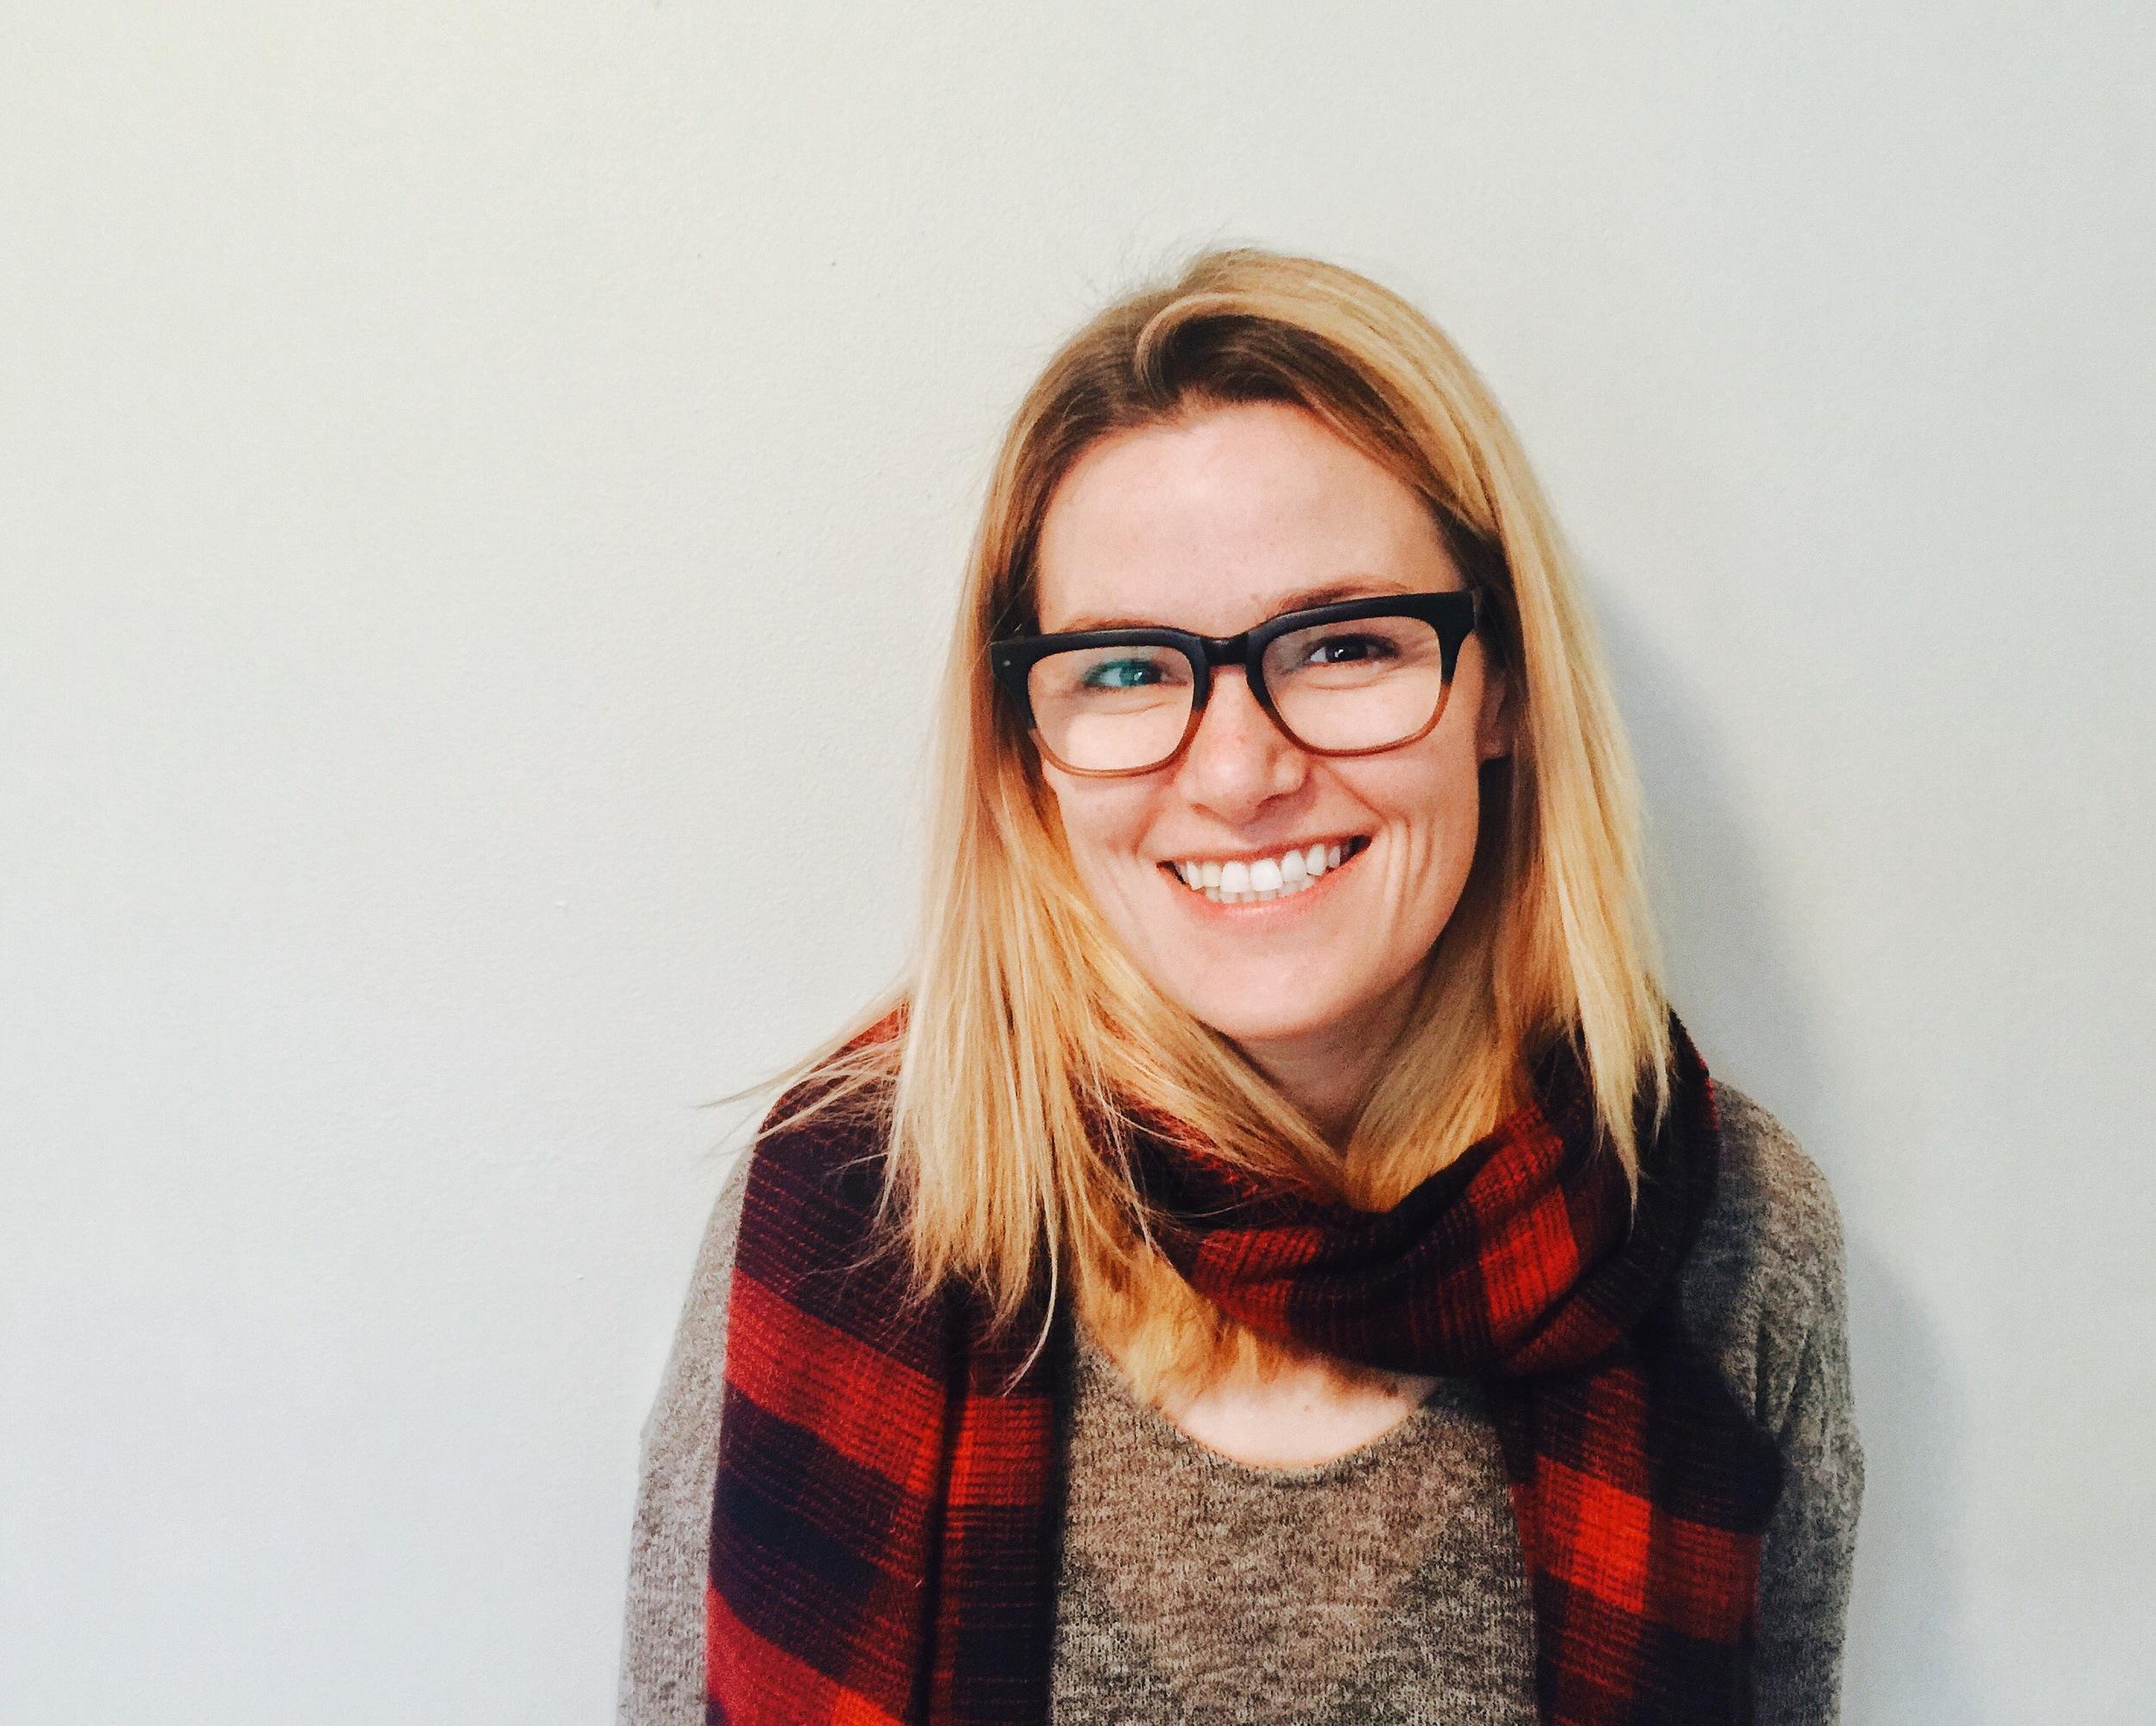 Sarah Nagle,Senior Manager for Design Insights at REI